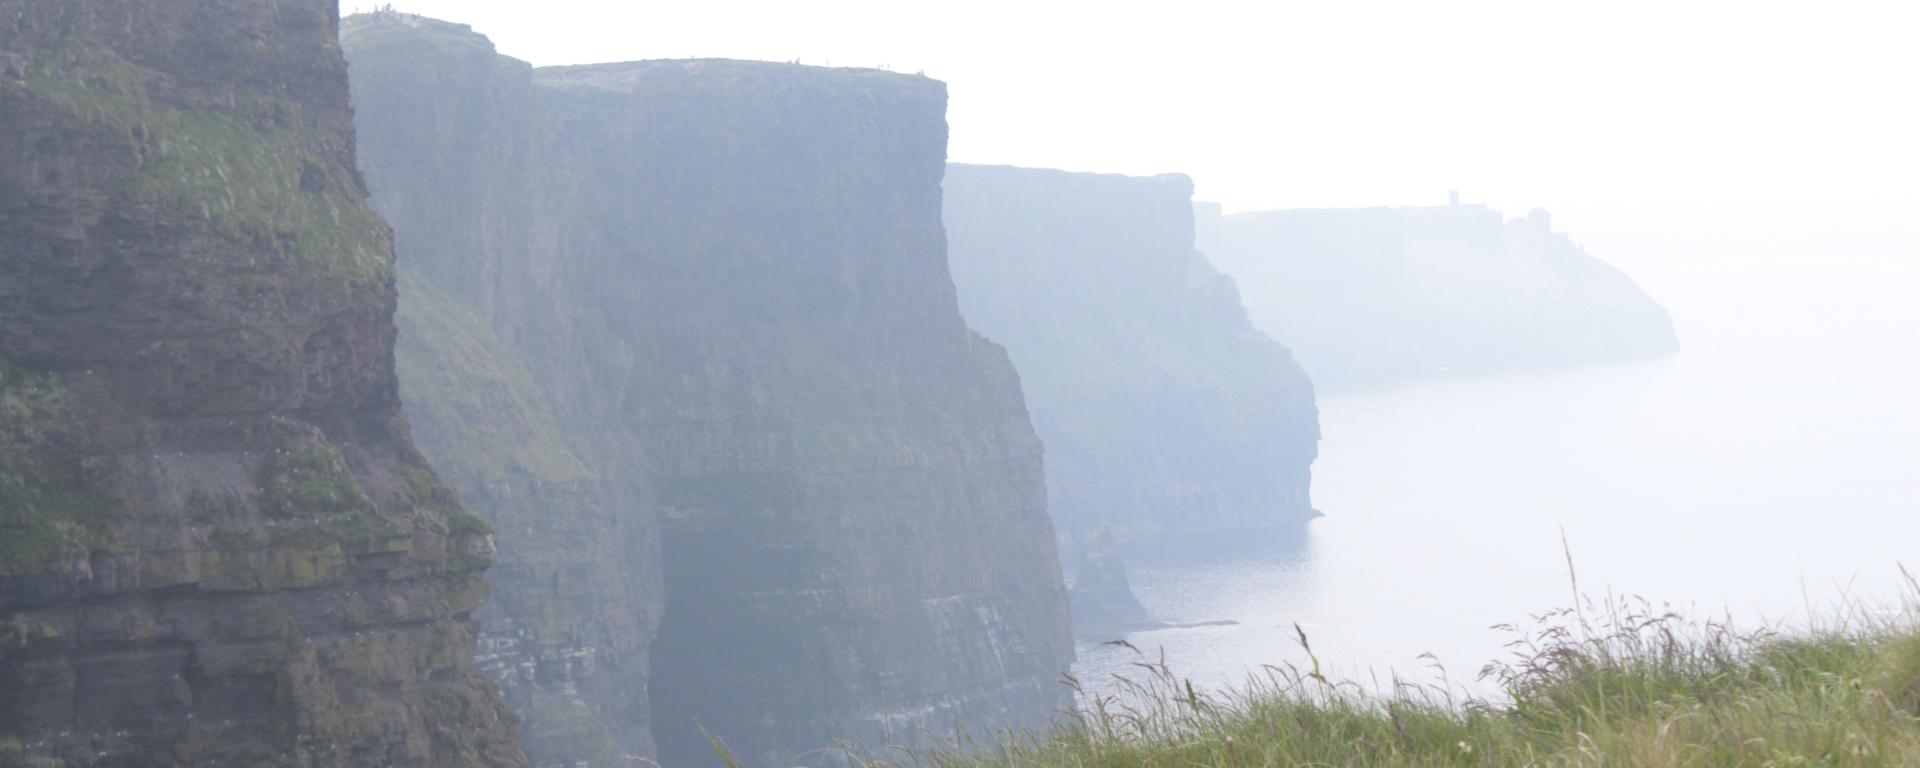 Cliffs of Moher Ireland, Cliffs of Moher, Ireland, Cliffs Moher, Moher Cliffs, Cliffs of Moher County Clare, Ireland photography, Photography, Photos